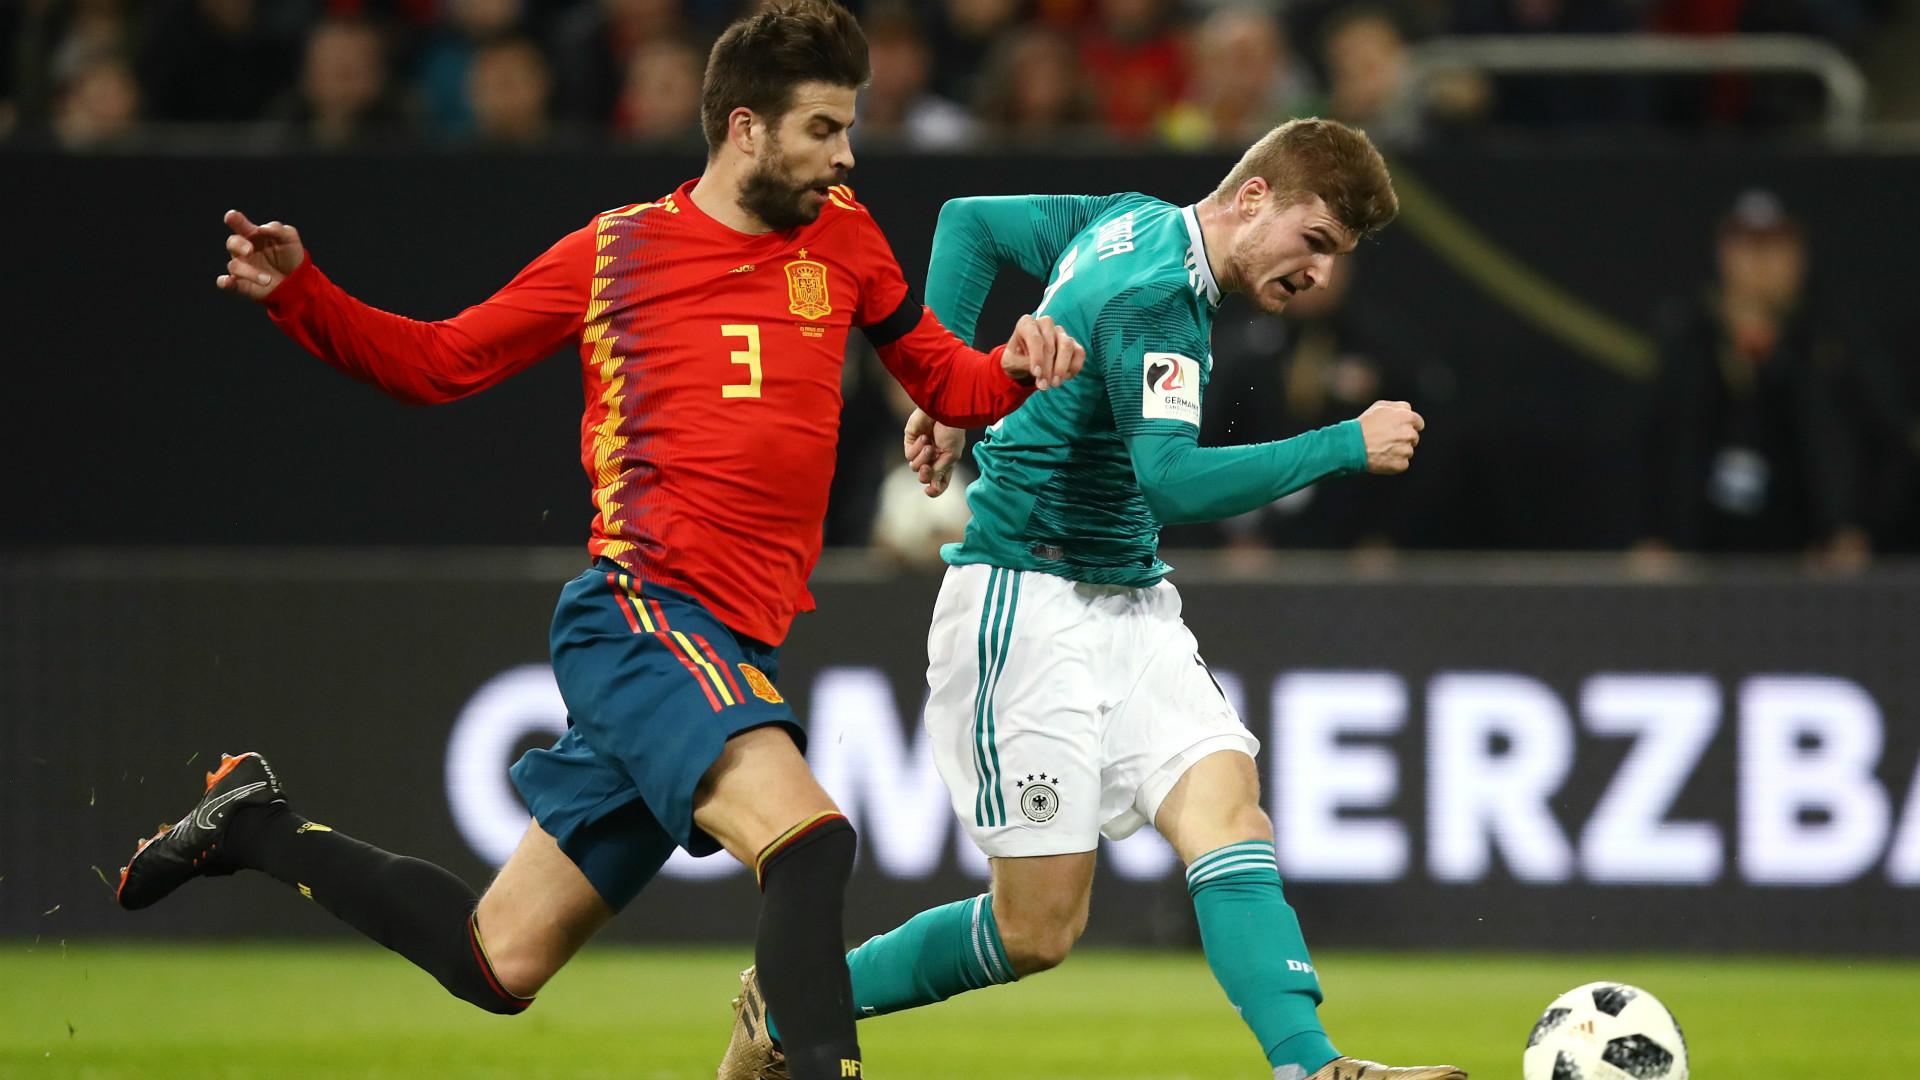 Piqué Werner Alemania España Amistoso Internacional